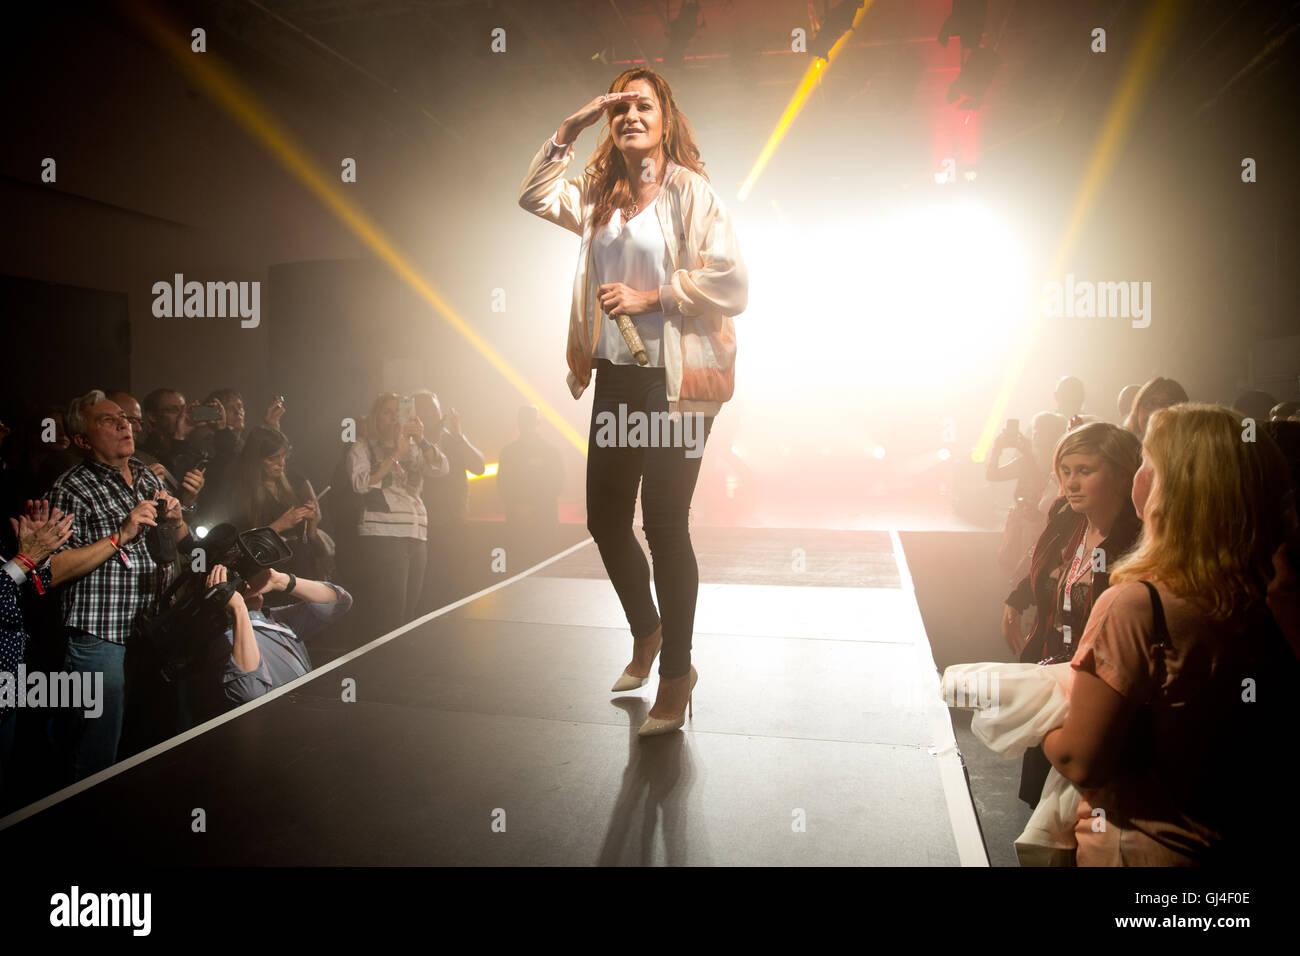 Berlin Deutschland 11 August 2016 Schlager Sängerin Andrea Berg